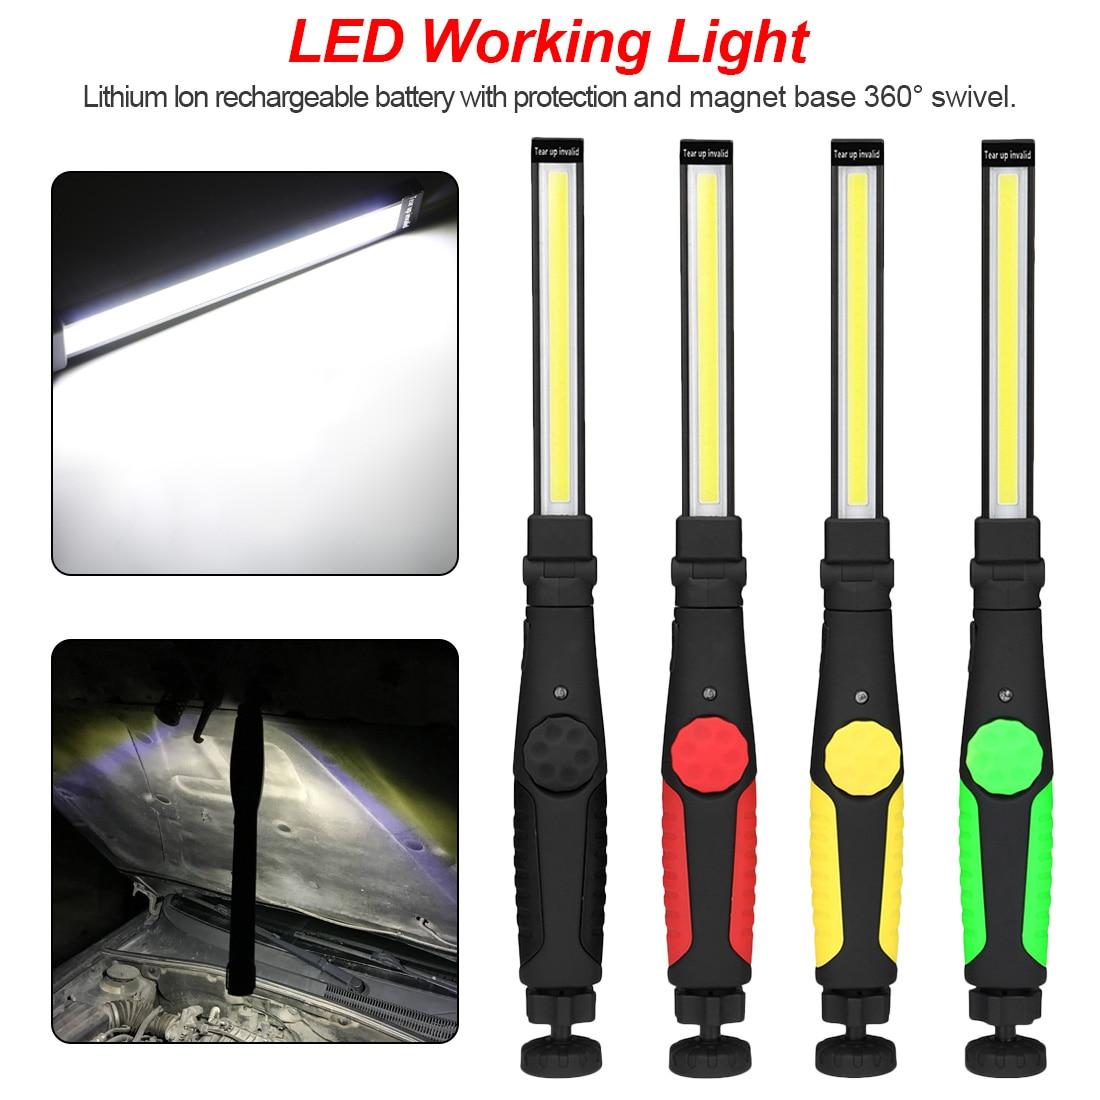 Upgraded Rotated Foldable Portable COB Flashlight Torch USB Rechargeable LED Work Light Magnetic COB Lantern Portable Spotlight